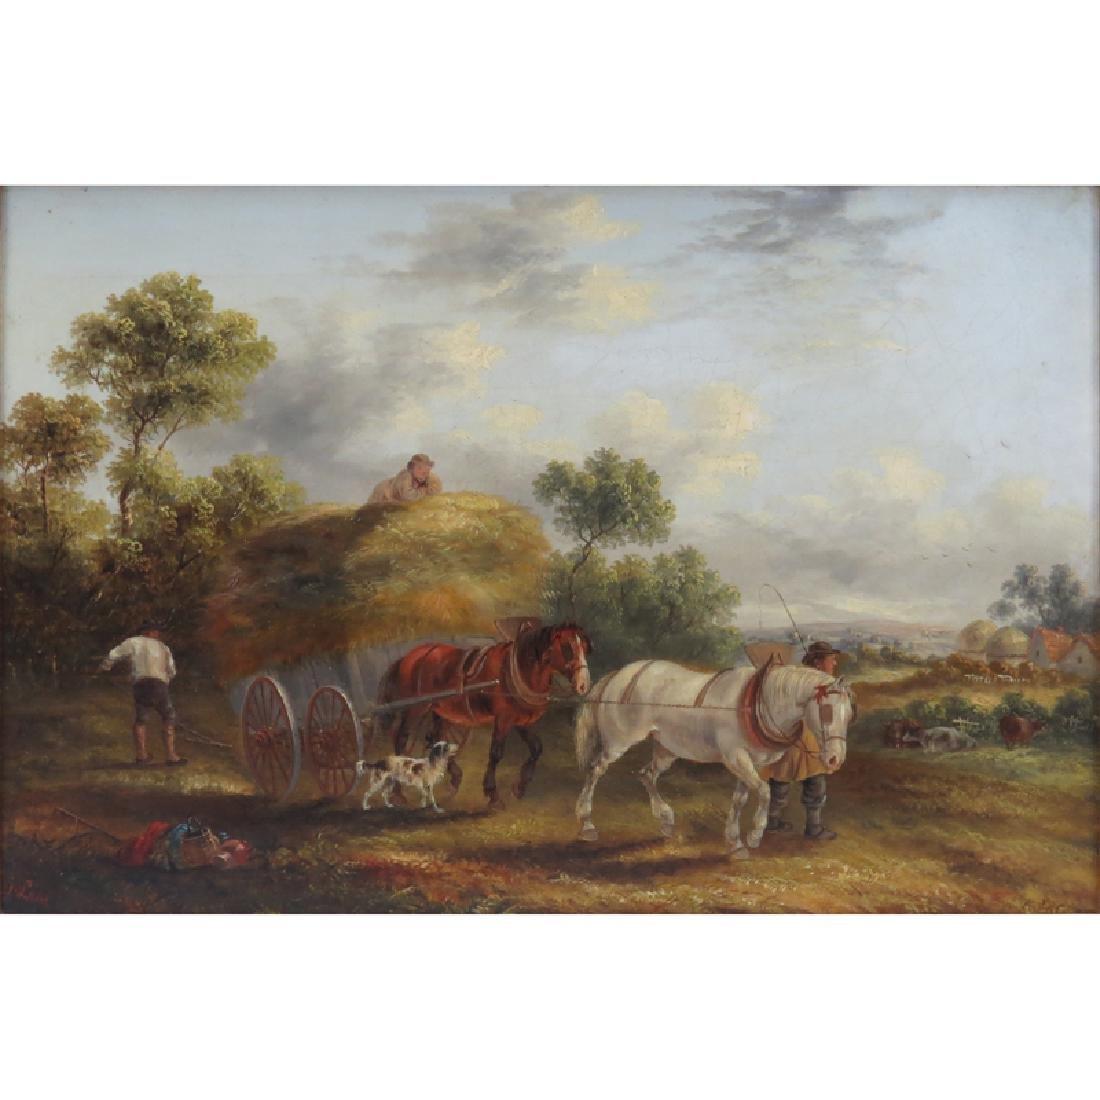 Georgina Lara, British  (fl.1862 - 1871) Oil on canvas